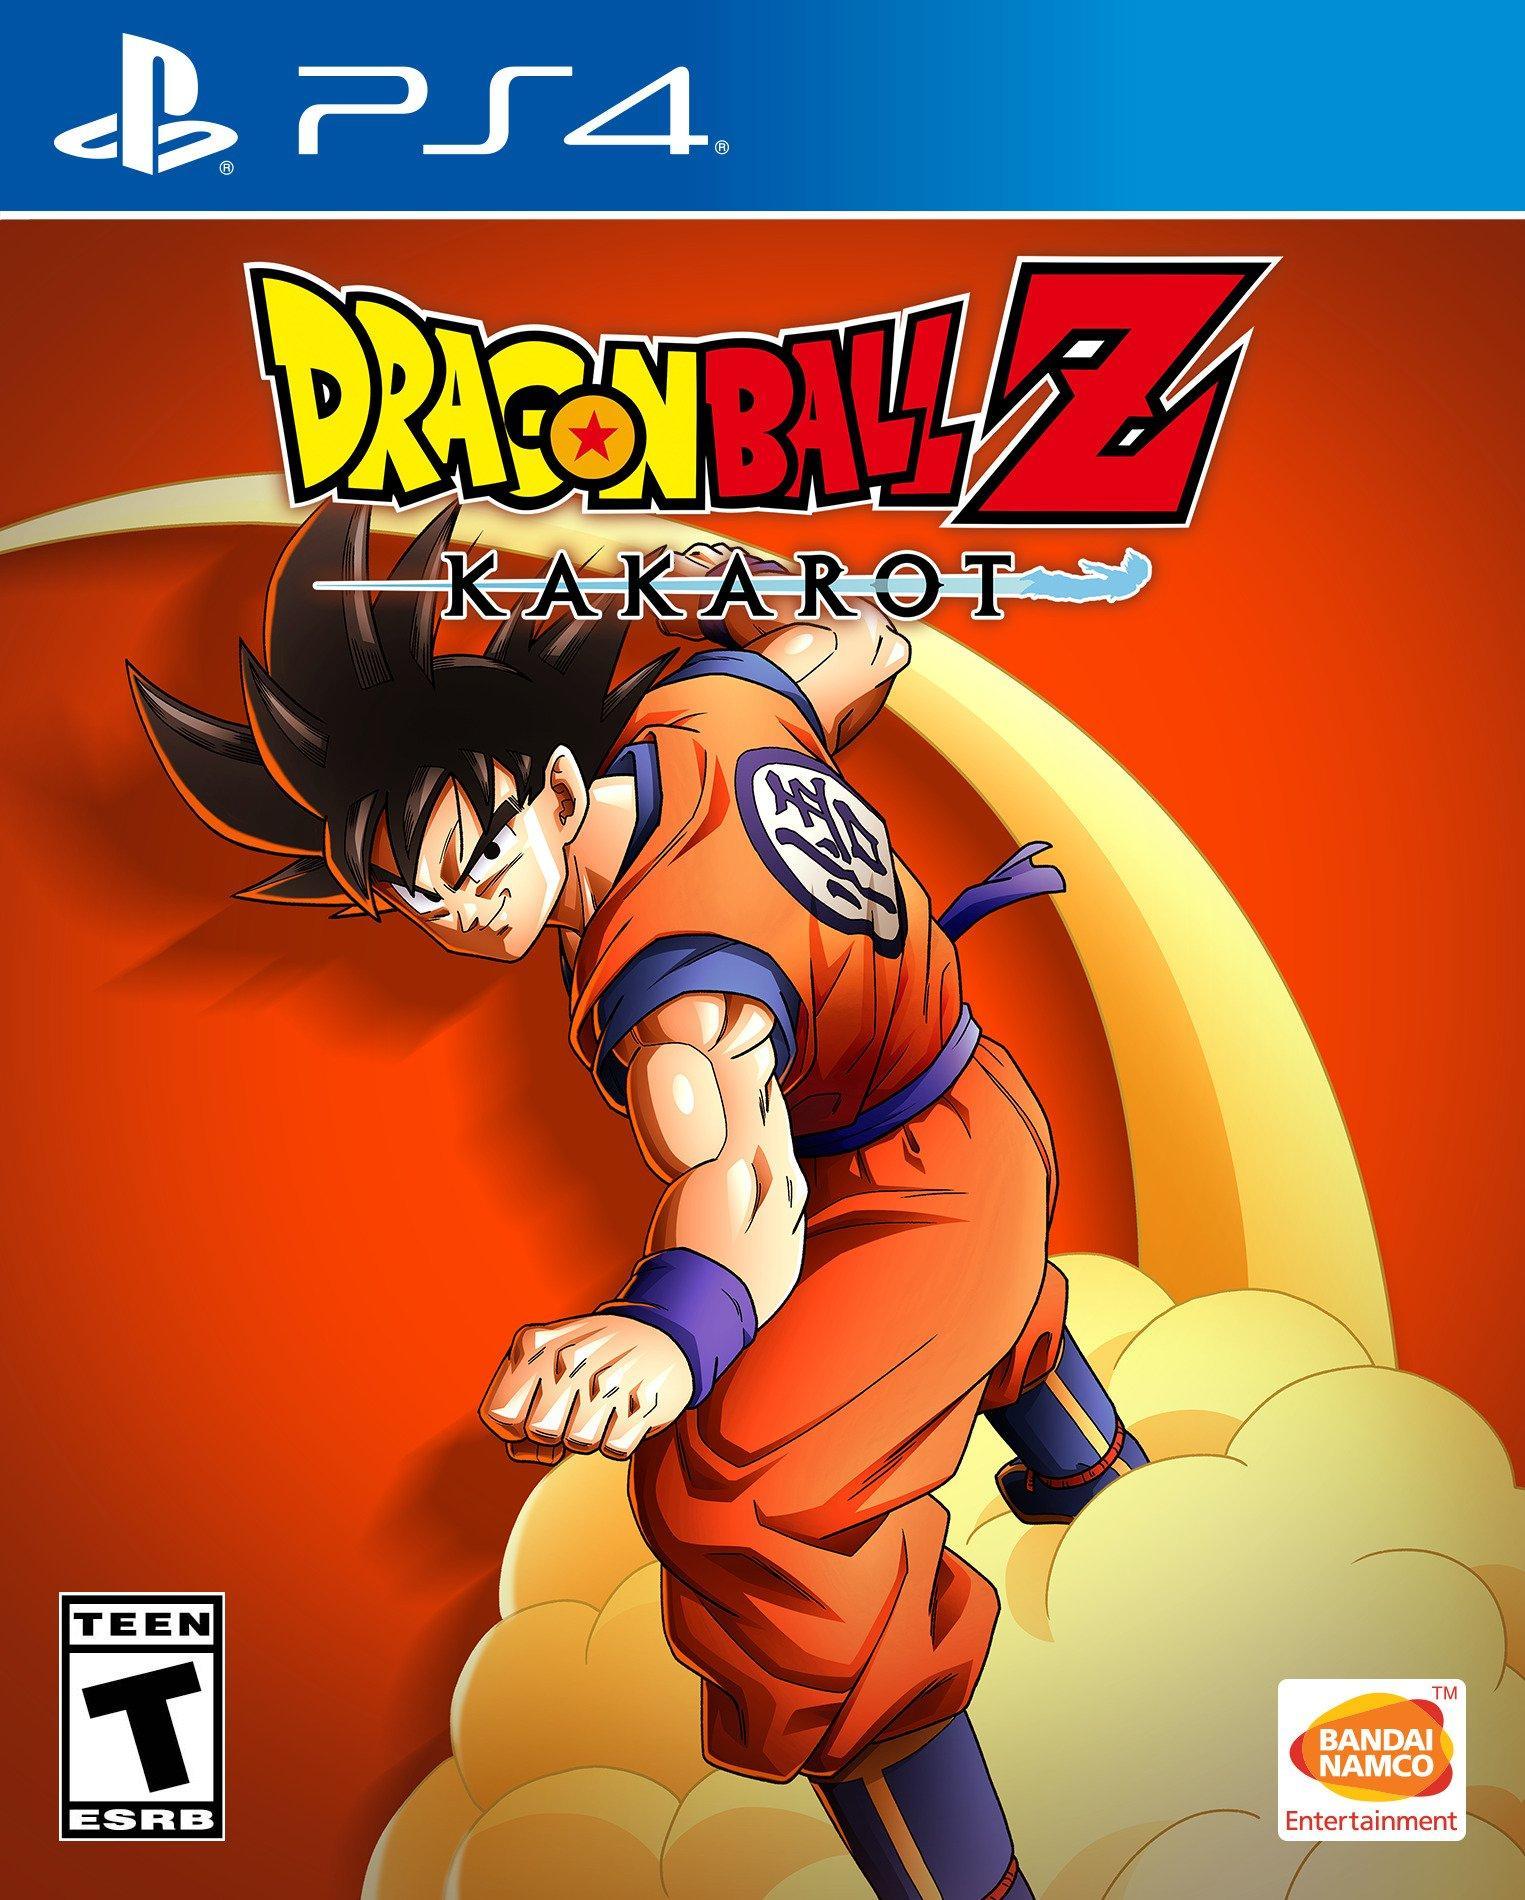 Dragon Ball Z: Kakarot | PlayStation 4 | GameStop